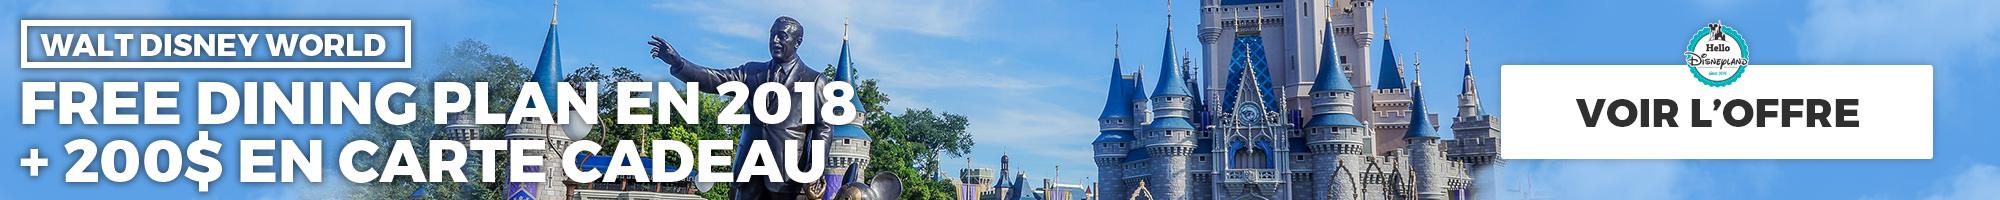 Walt Disney World Free Dining Plan 2018